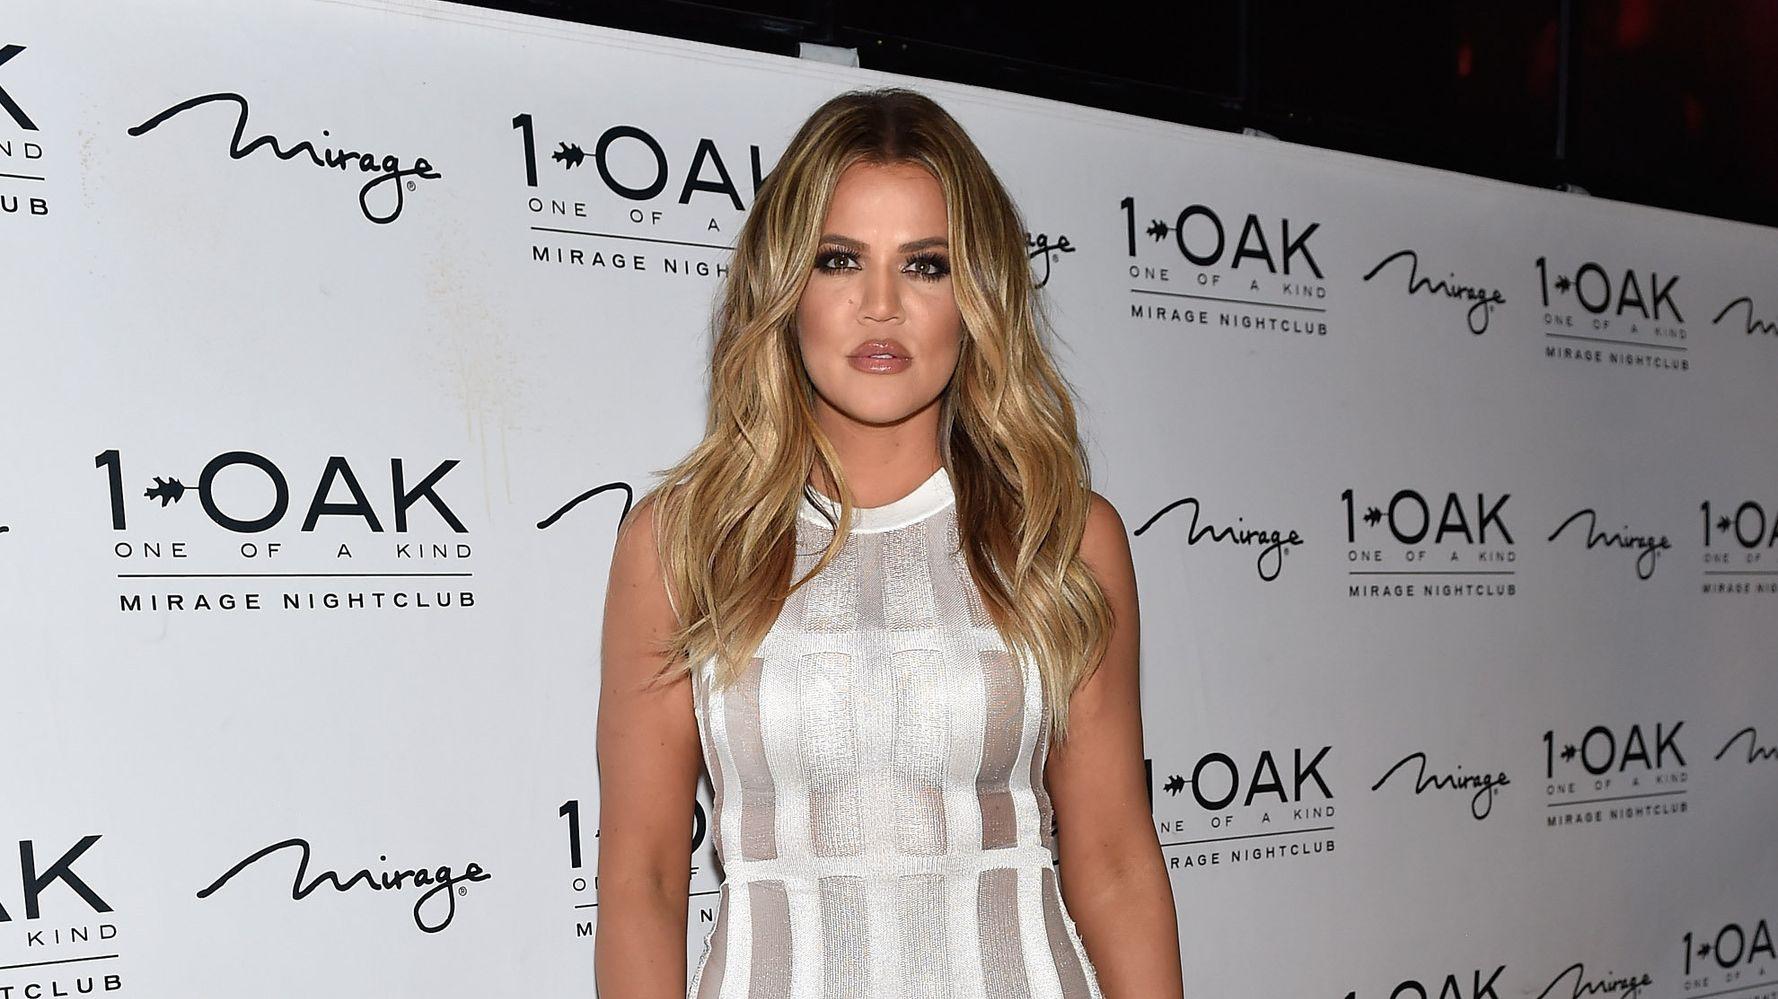 Khloe Kardashian Showed A Lot Of Skin This Year